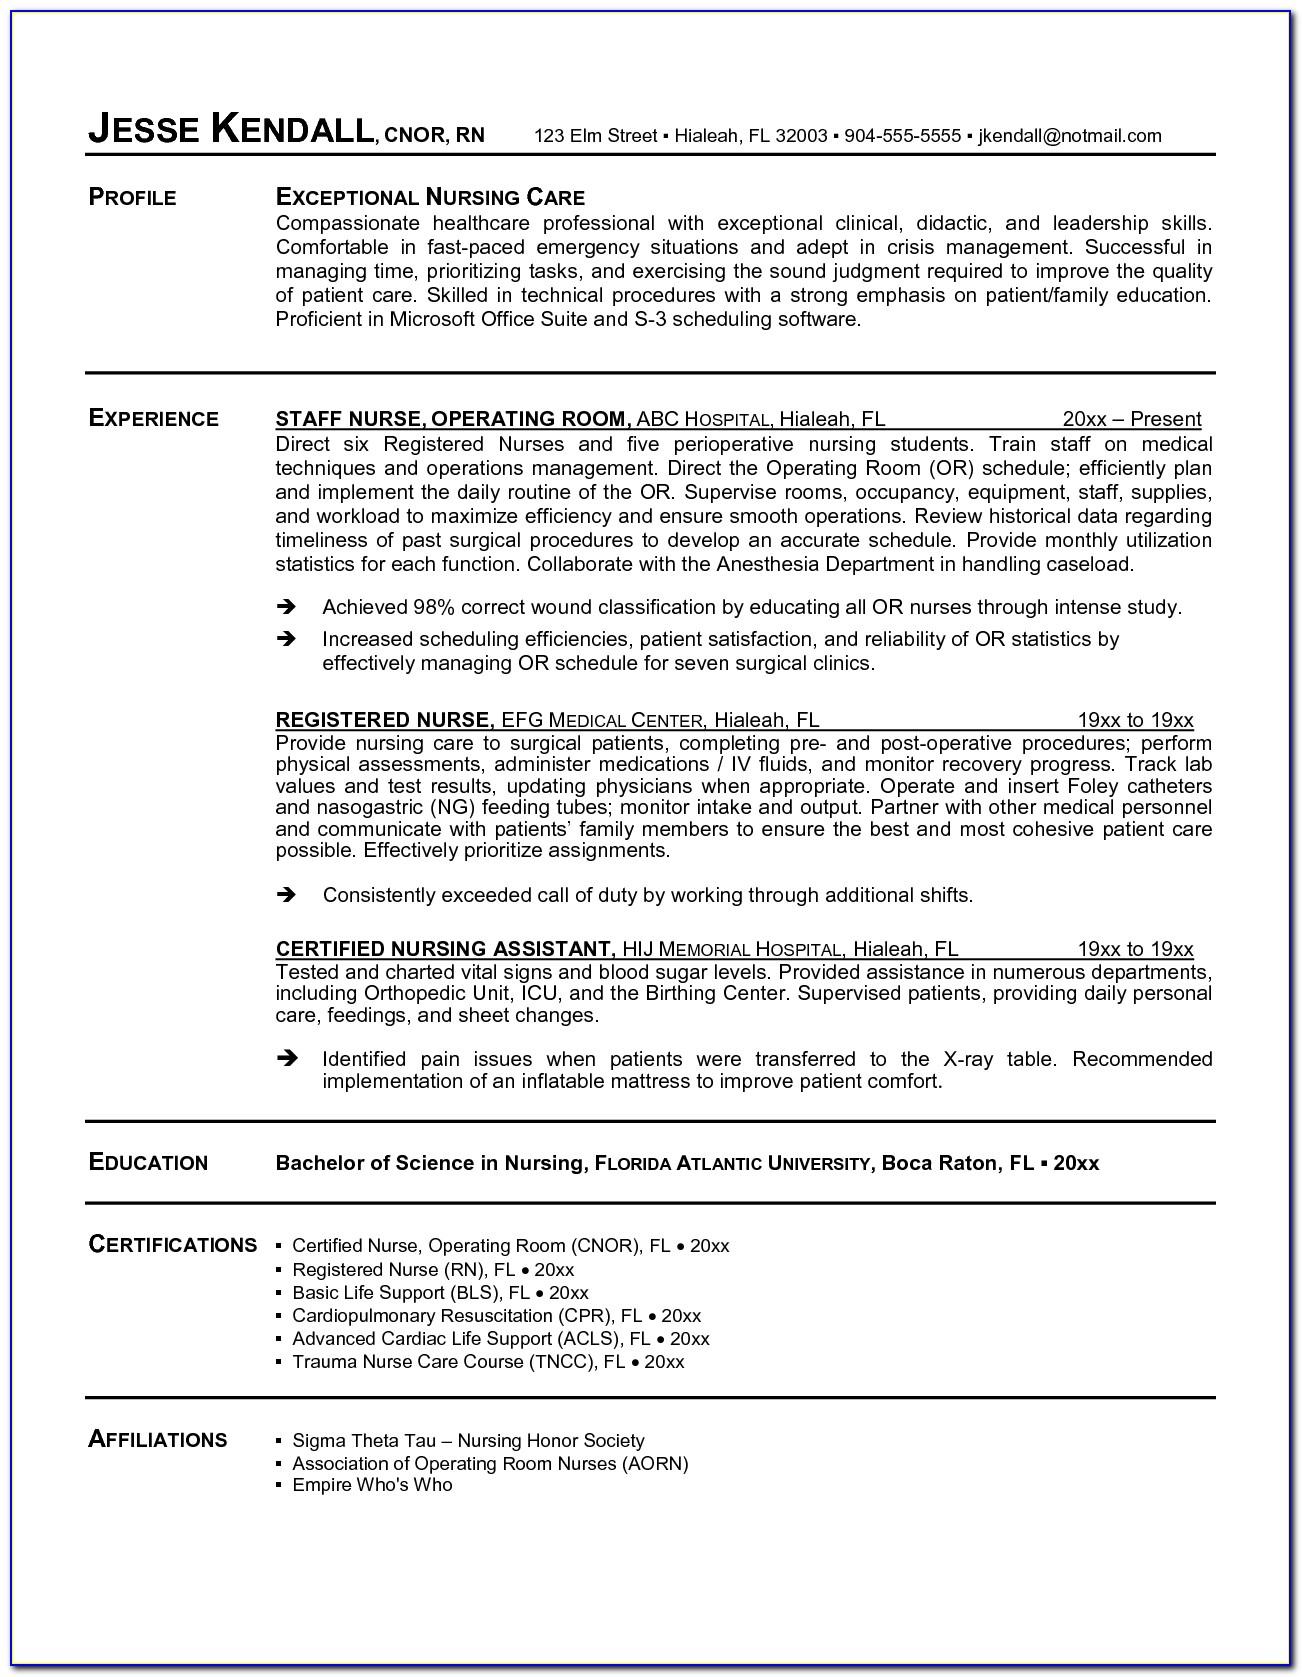 Personal Nurse Sample Resume.html For Sample Resume For Registered Nurse